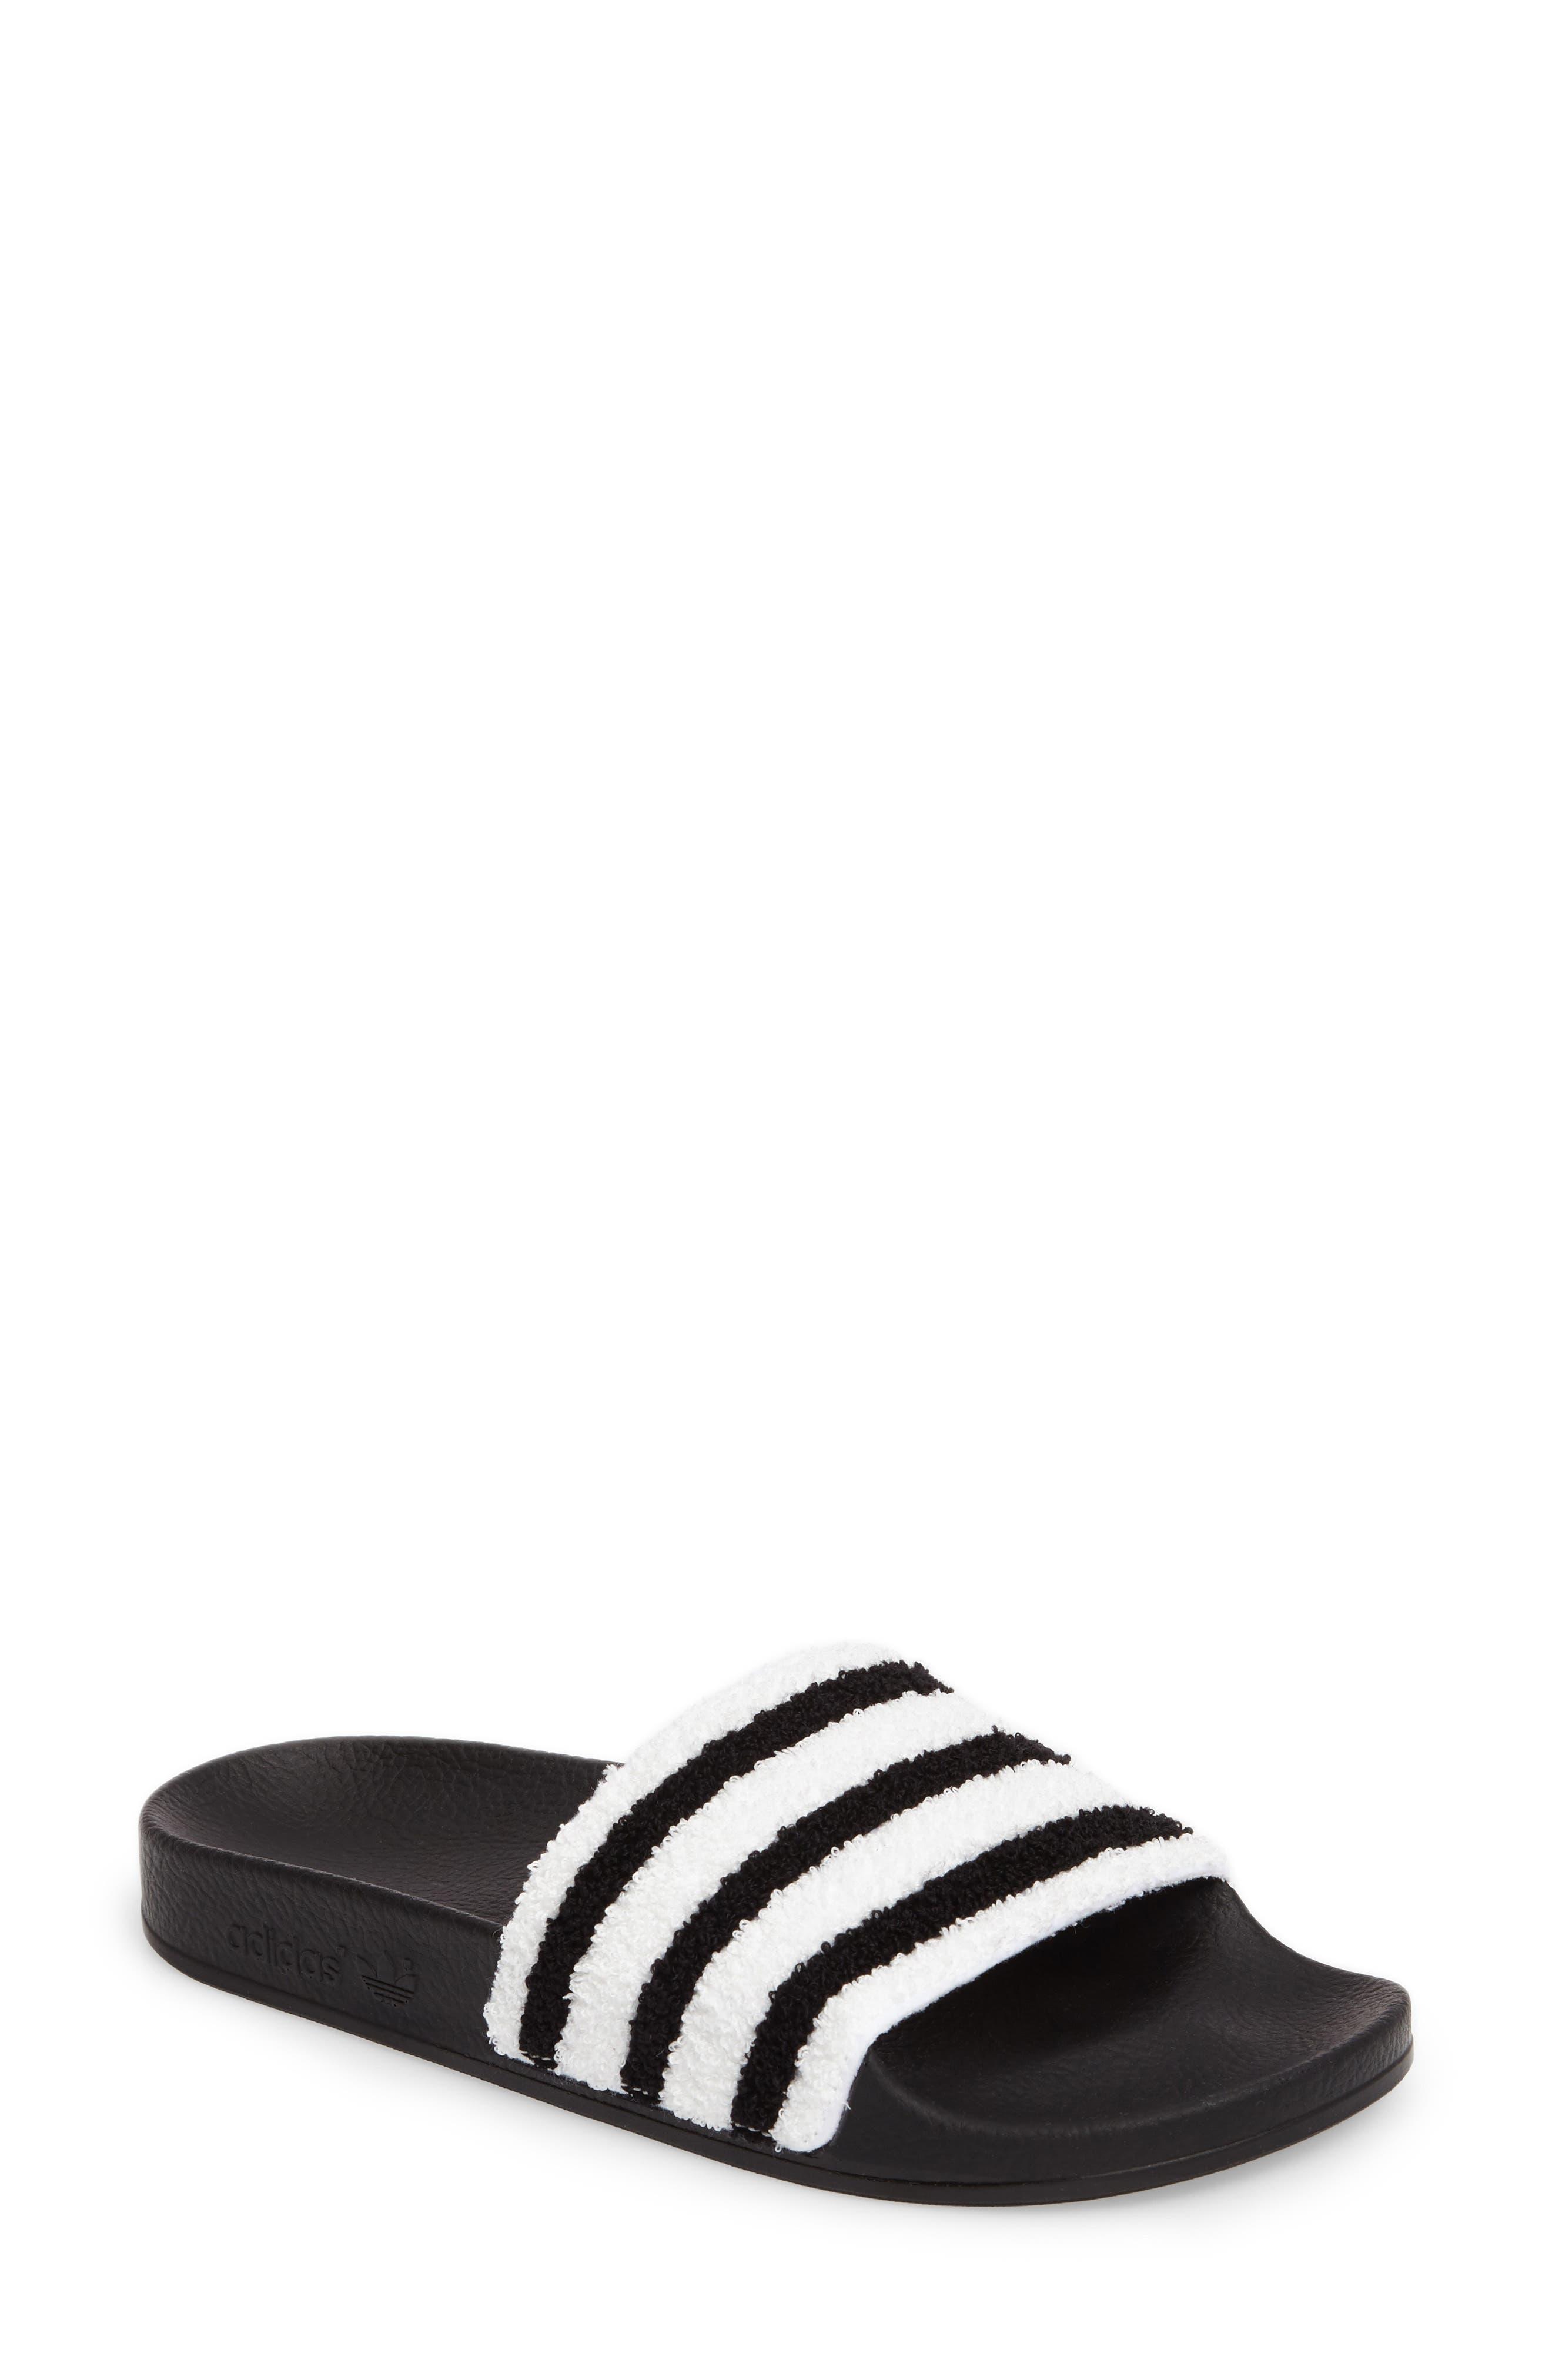 Adidas Aqualette Womens Slides Black WGH6813